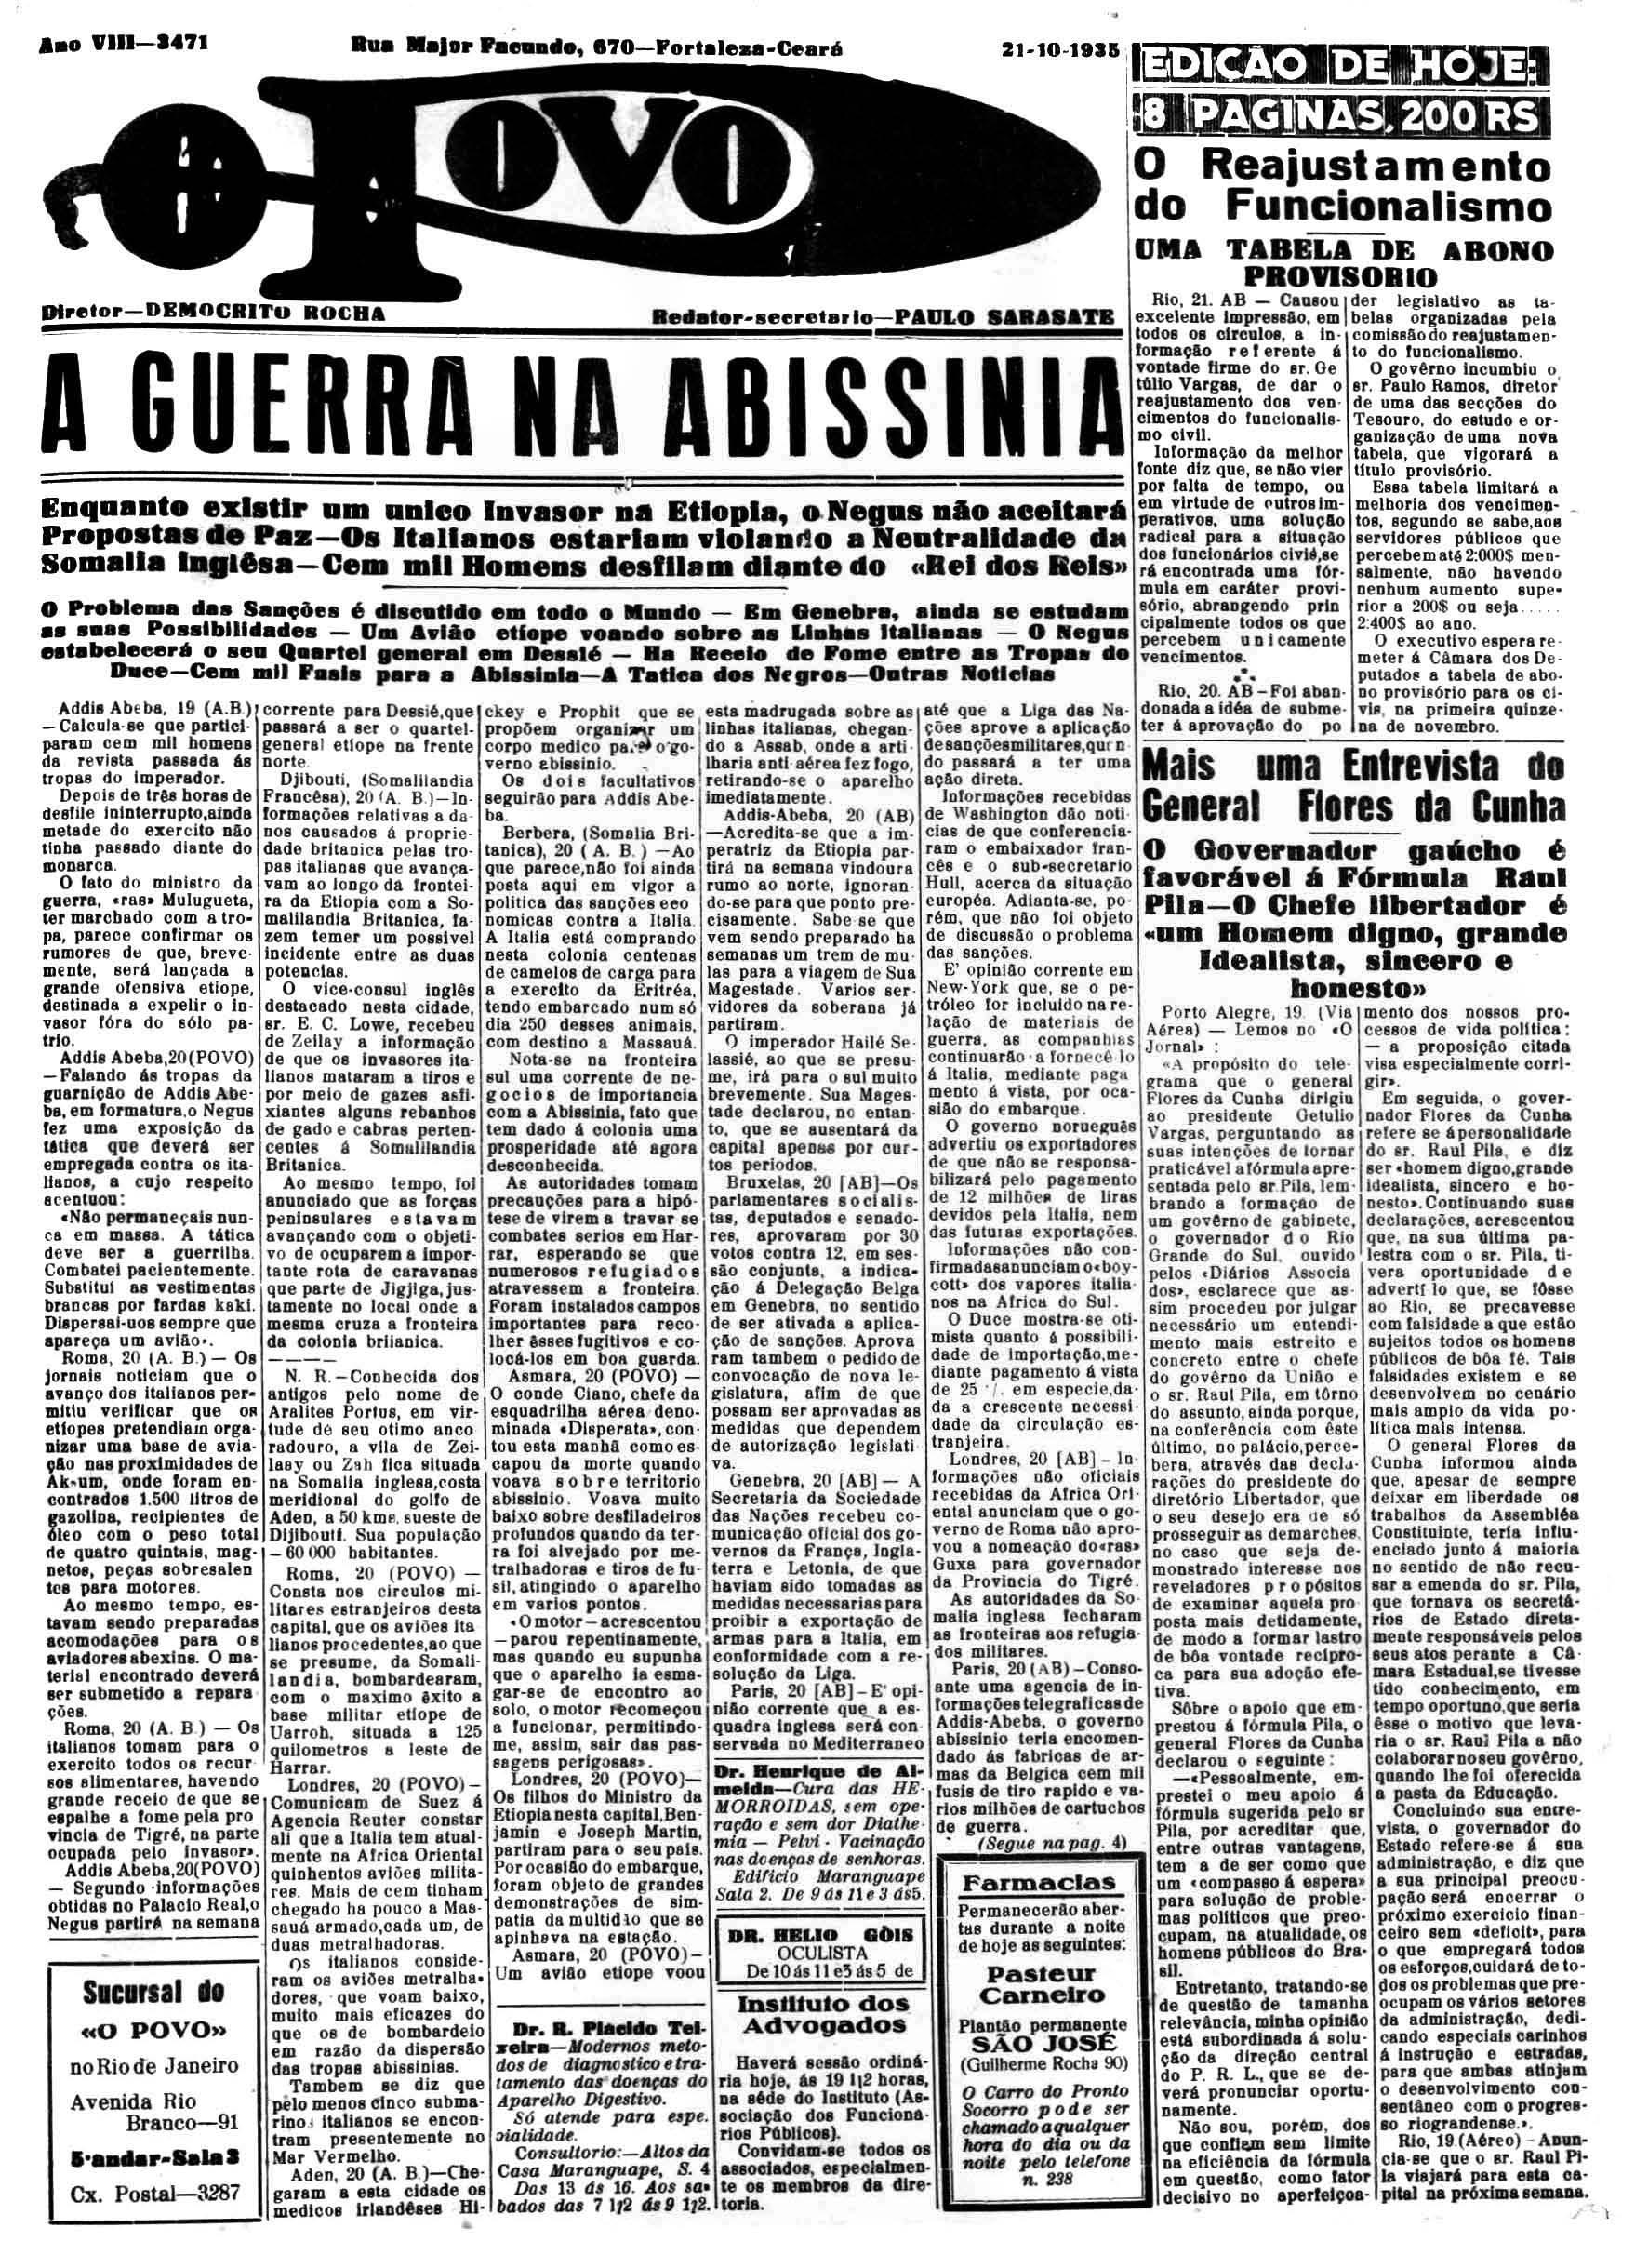 21-10-1935